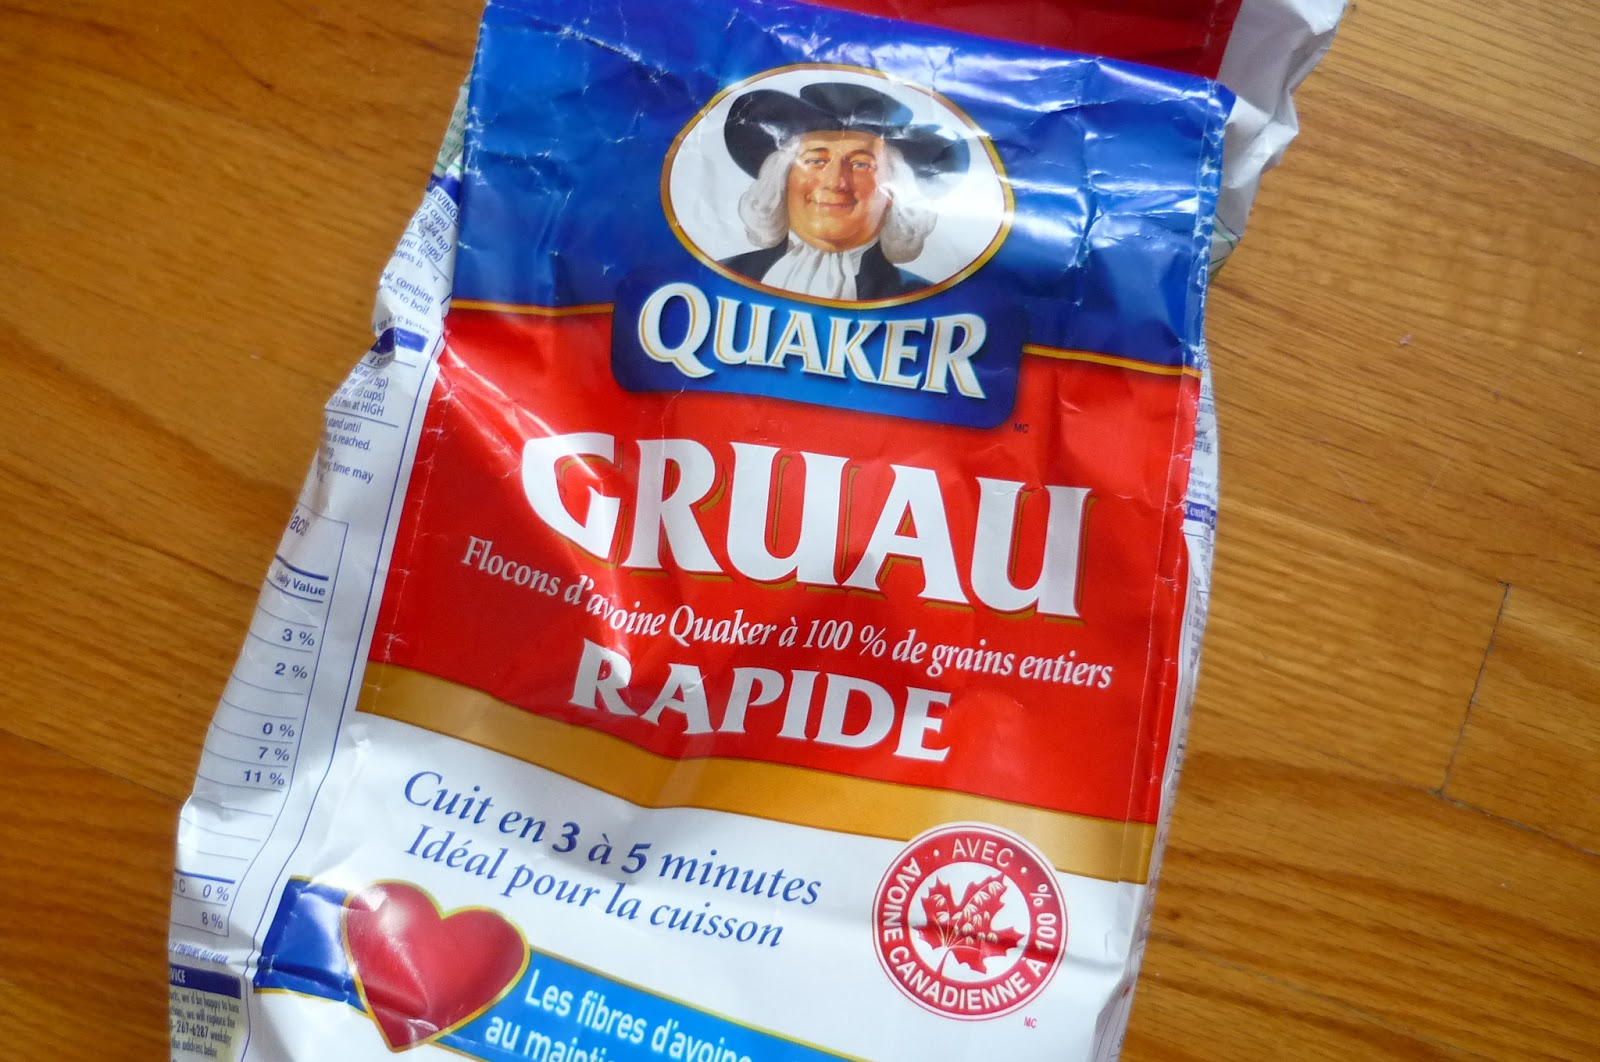 Gruau Quaker